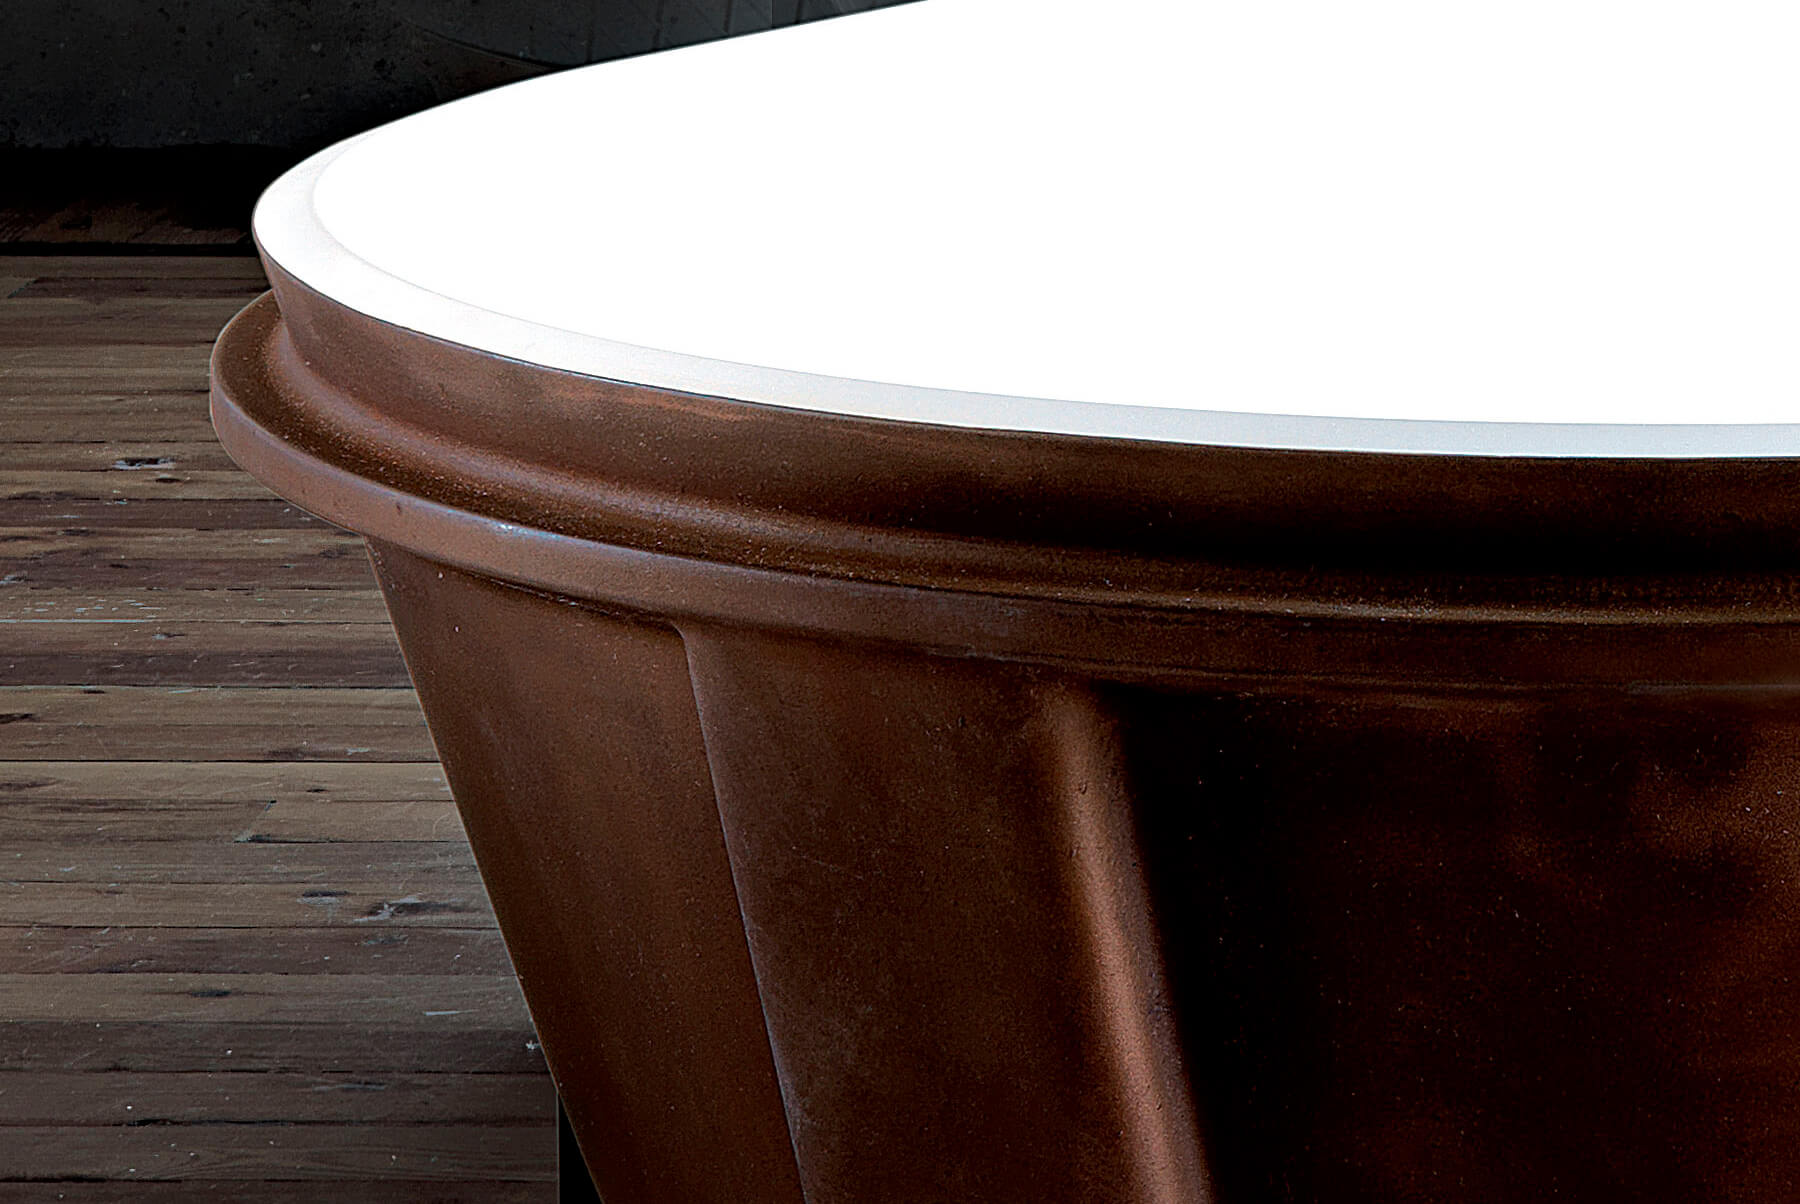 Bath-Tubs-Falper-Controstampo-detail-1800x1204